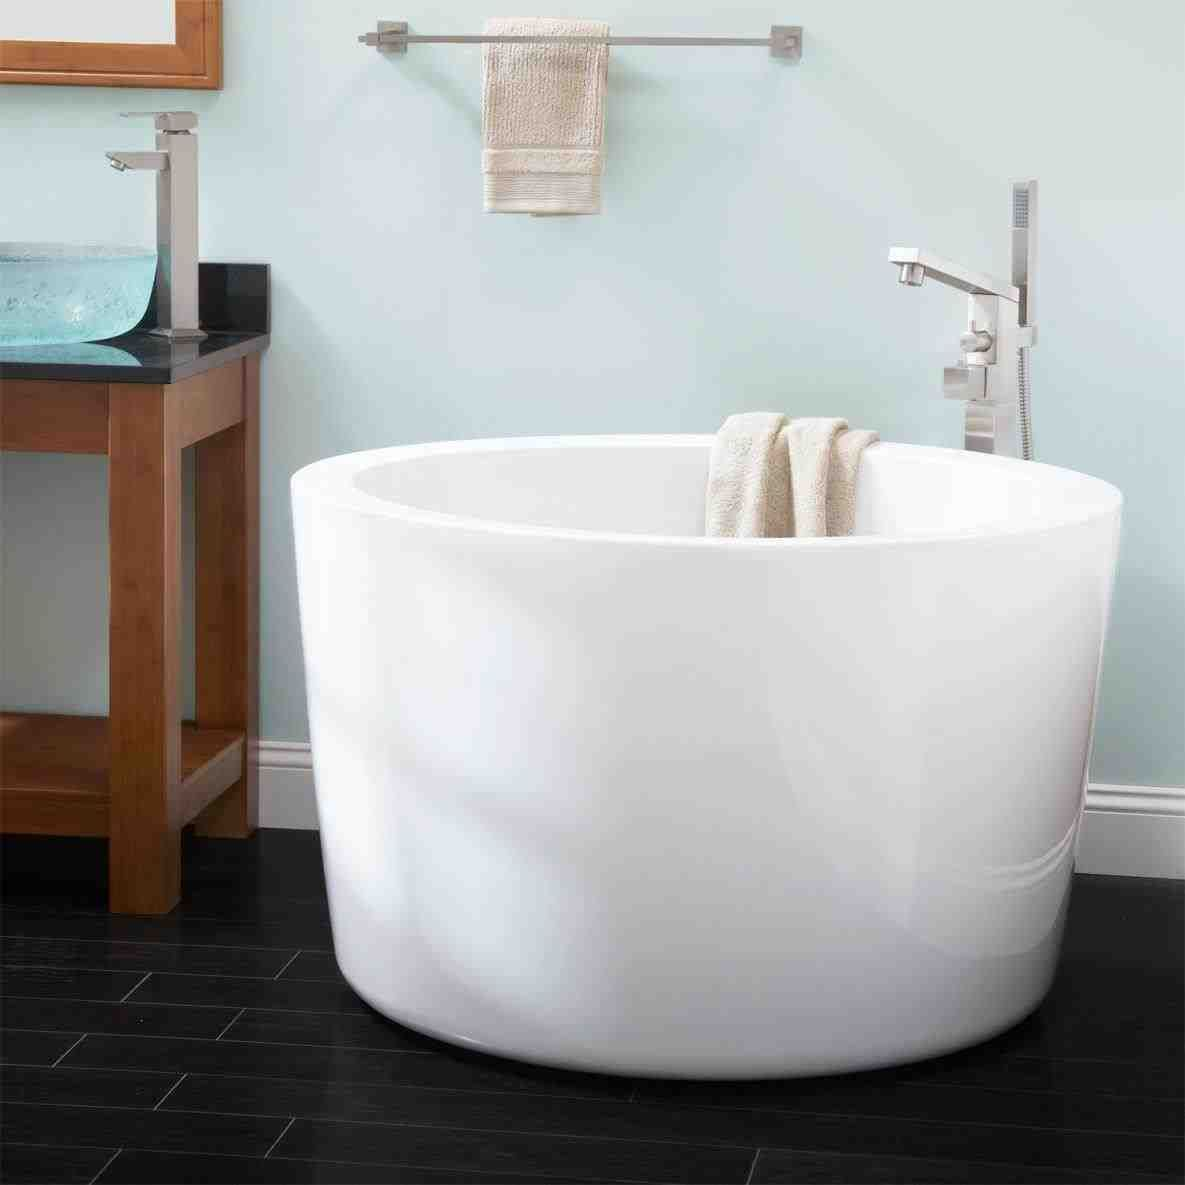 mirolin drop in mic soaking orillia corner water canada capri the tub tubs closet htm etobicoke kitchener ls item